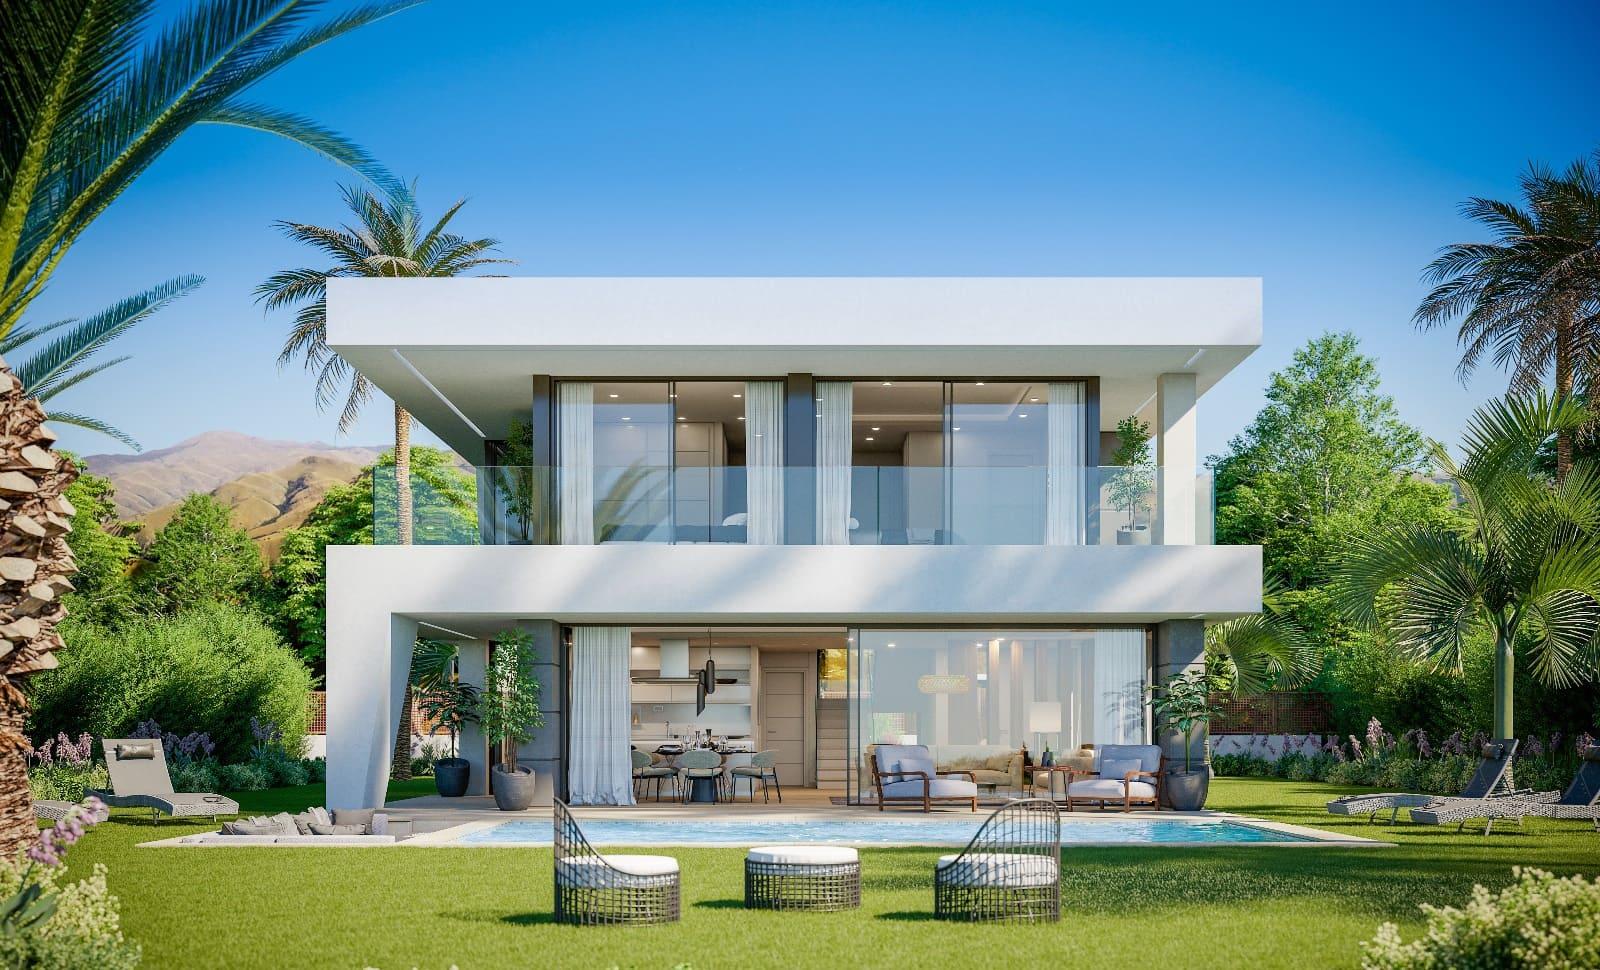 3 bedroom Villa for sale in Manilva with pool garage - € 525,000 (Ref: 5177387)